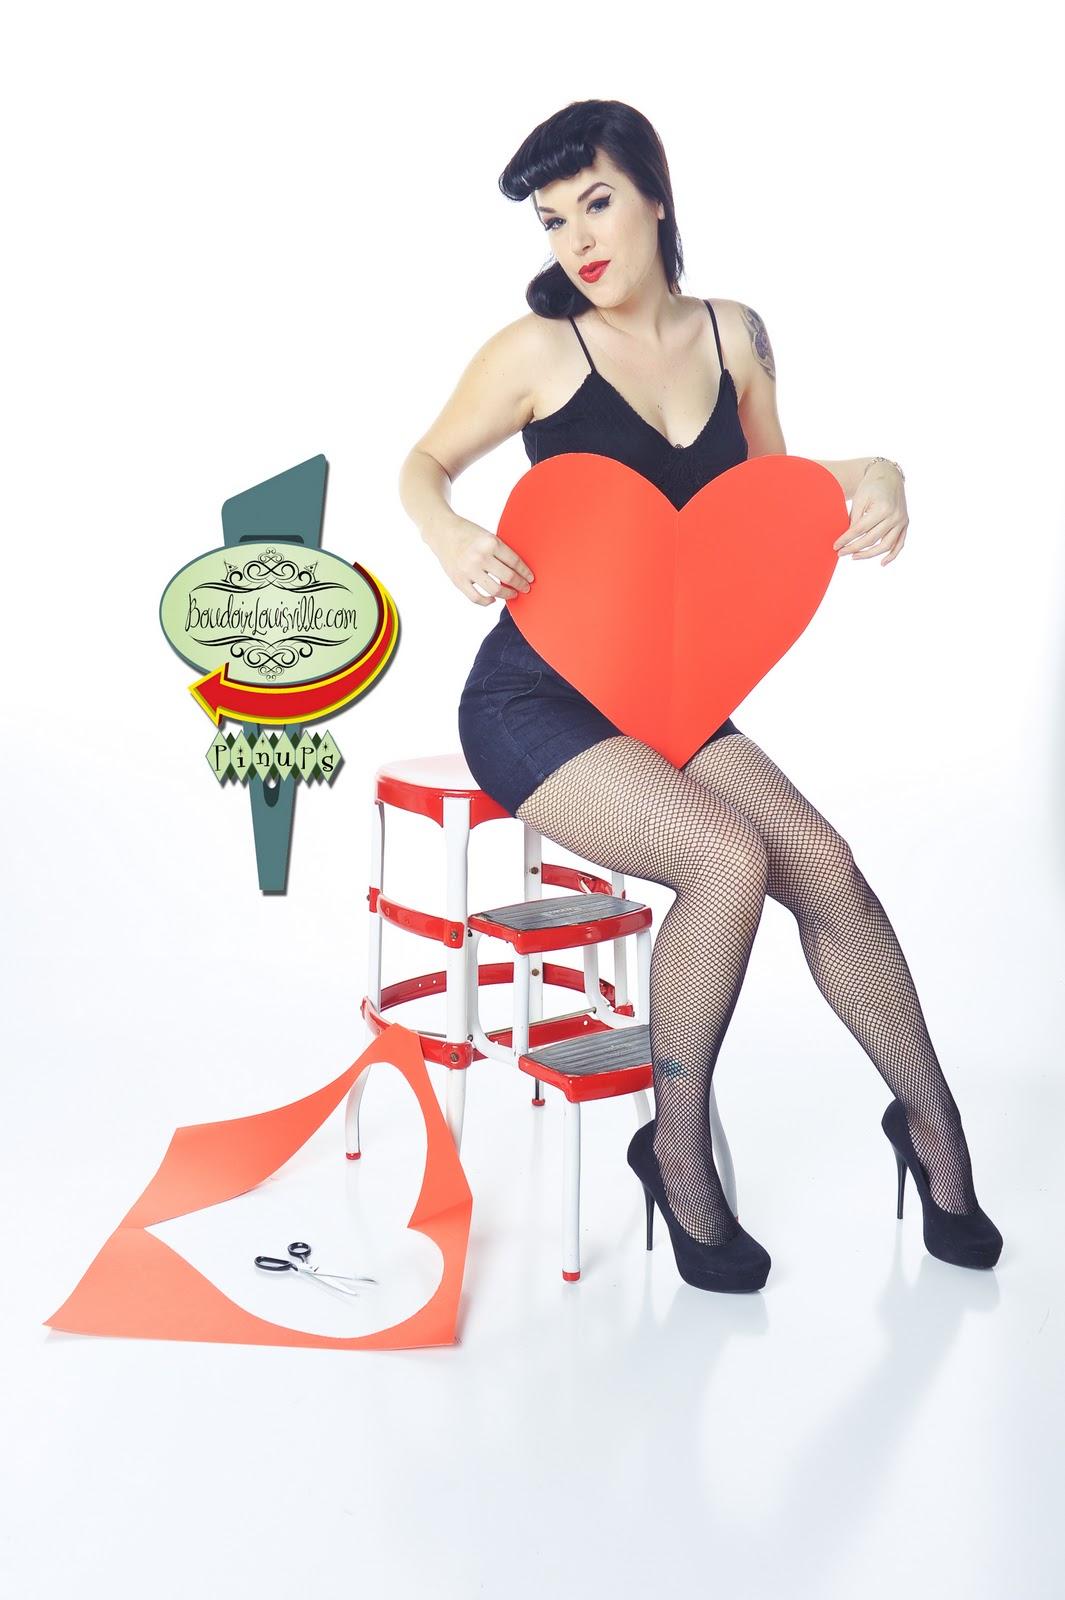 Studio betties pin up boudoir photography Boys Like Girls - Love Drunk - m Music